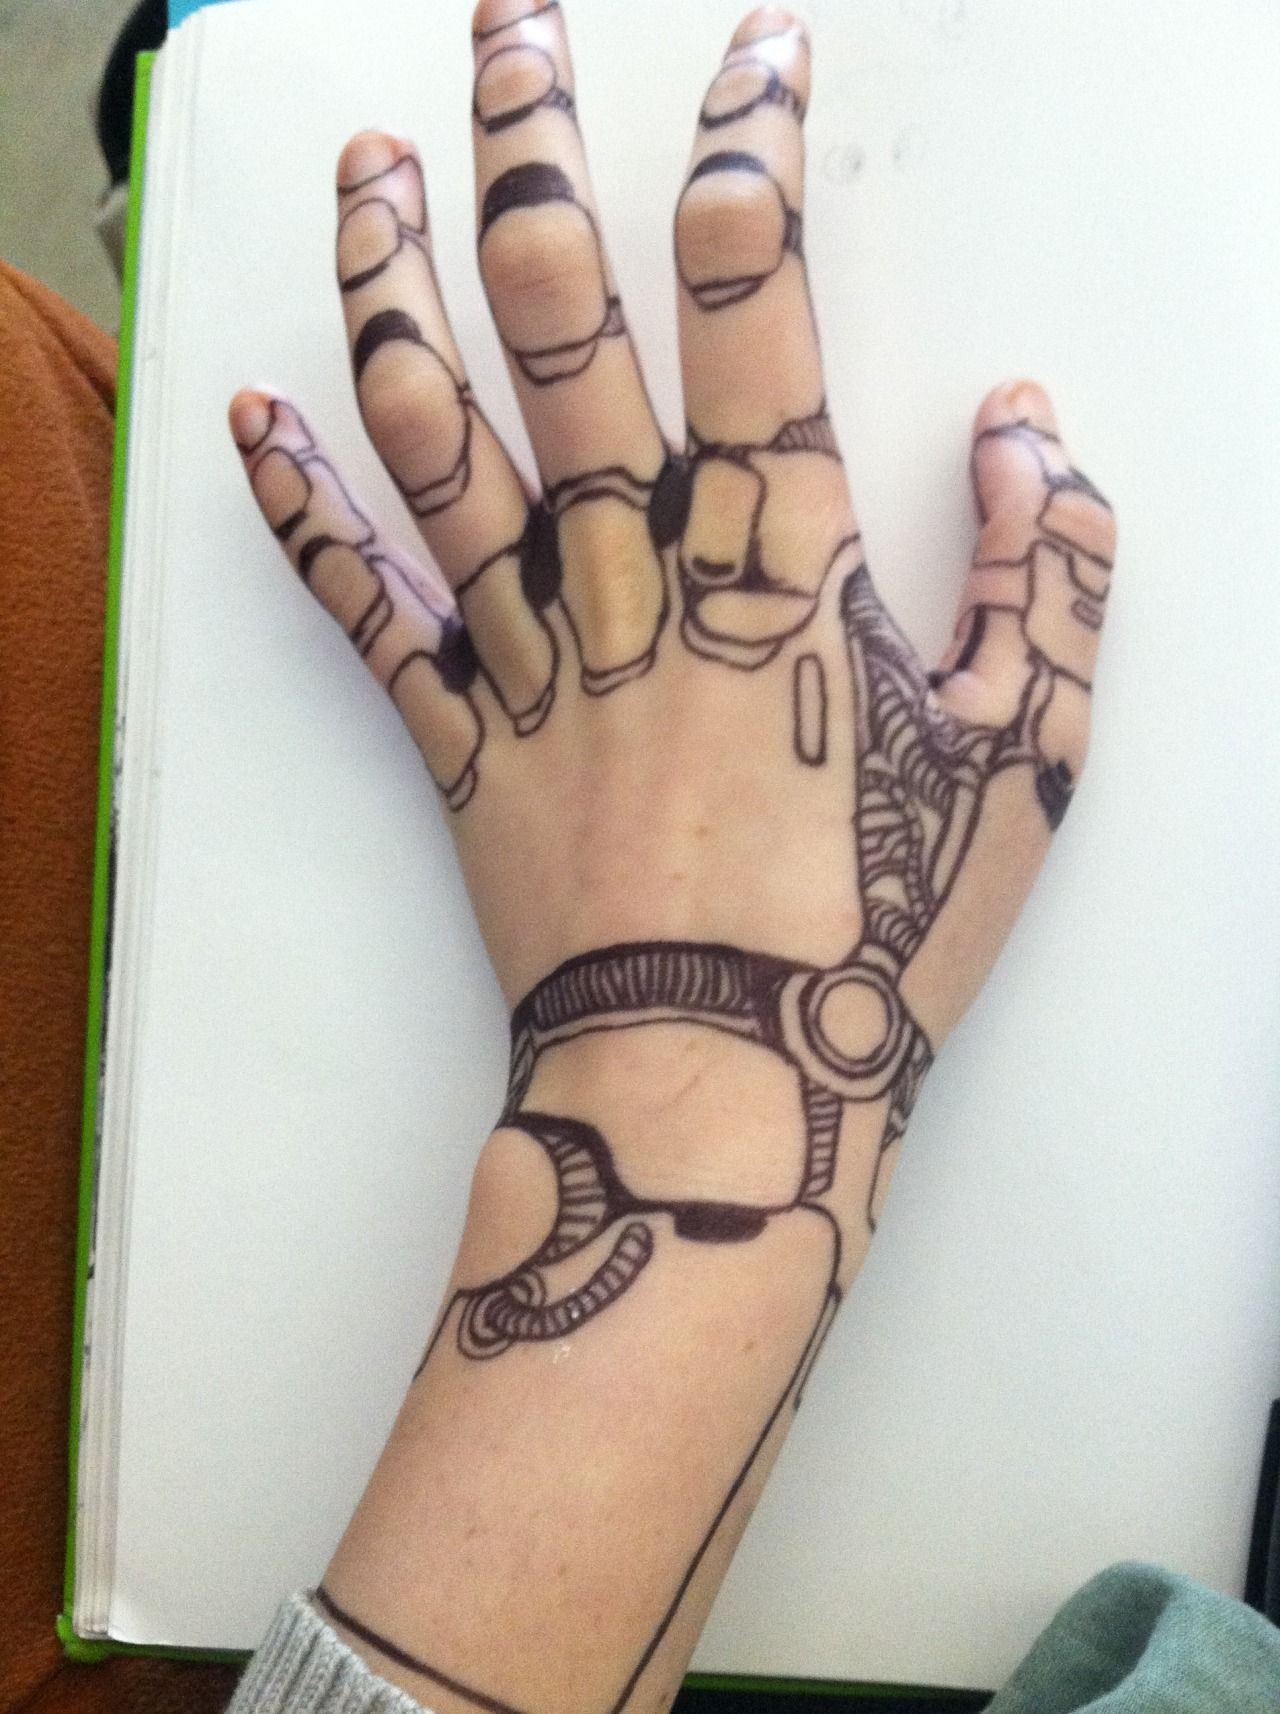 5b24e274f1471cf646e63d9fe70025a5 » Cool Things To Draw On Your Arm